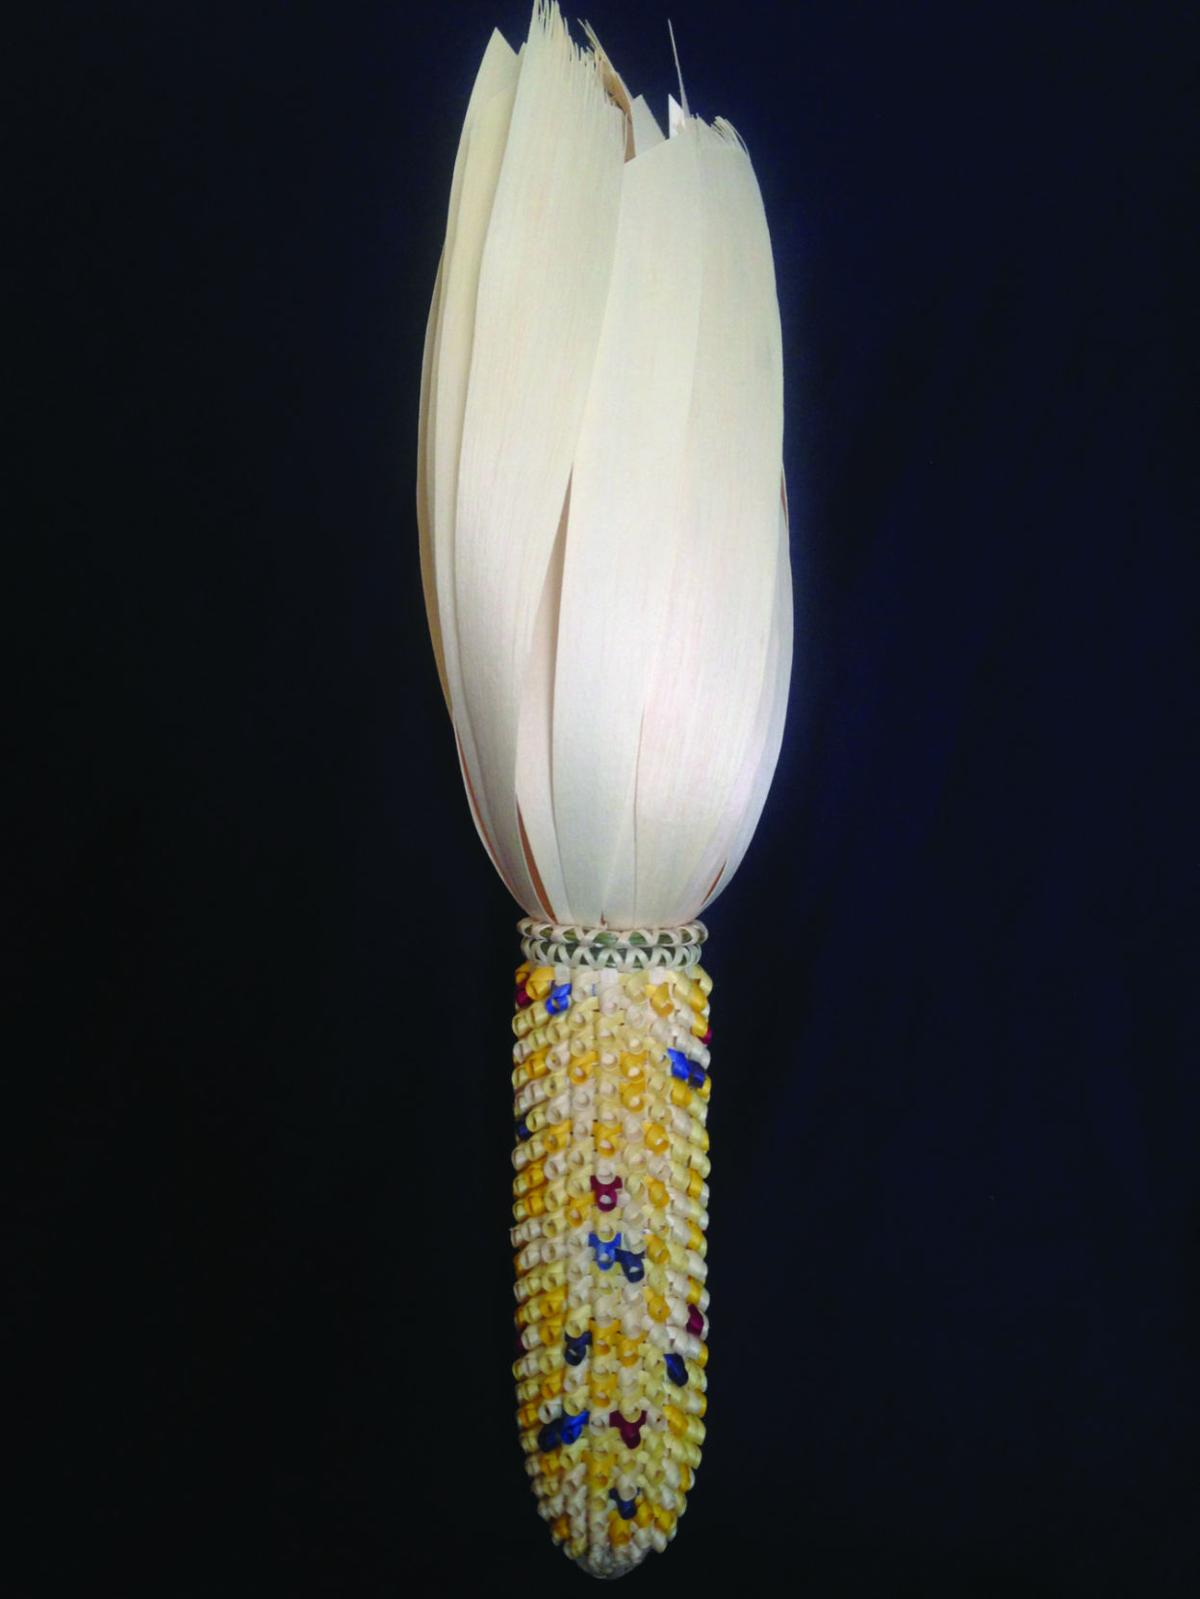 Theresa Secord Corn